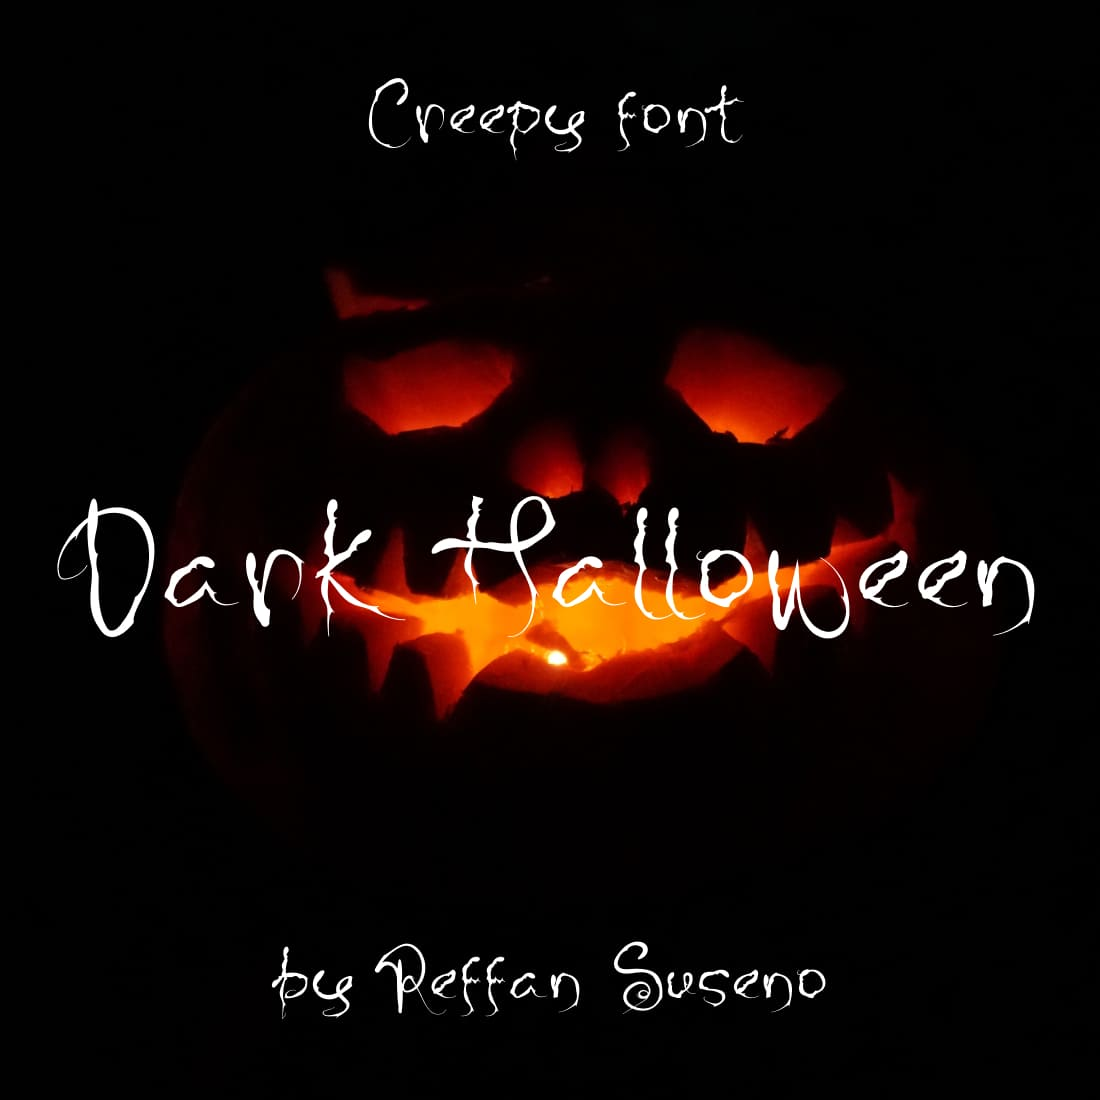 Dark Halloween best free font halloween Main Cover Image by MasterBundles.